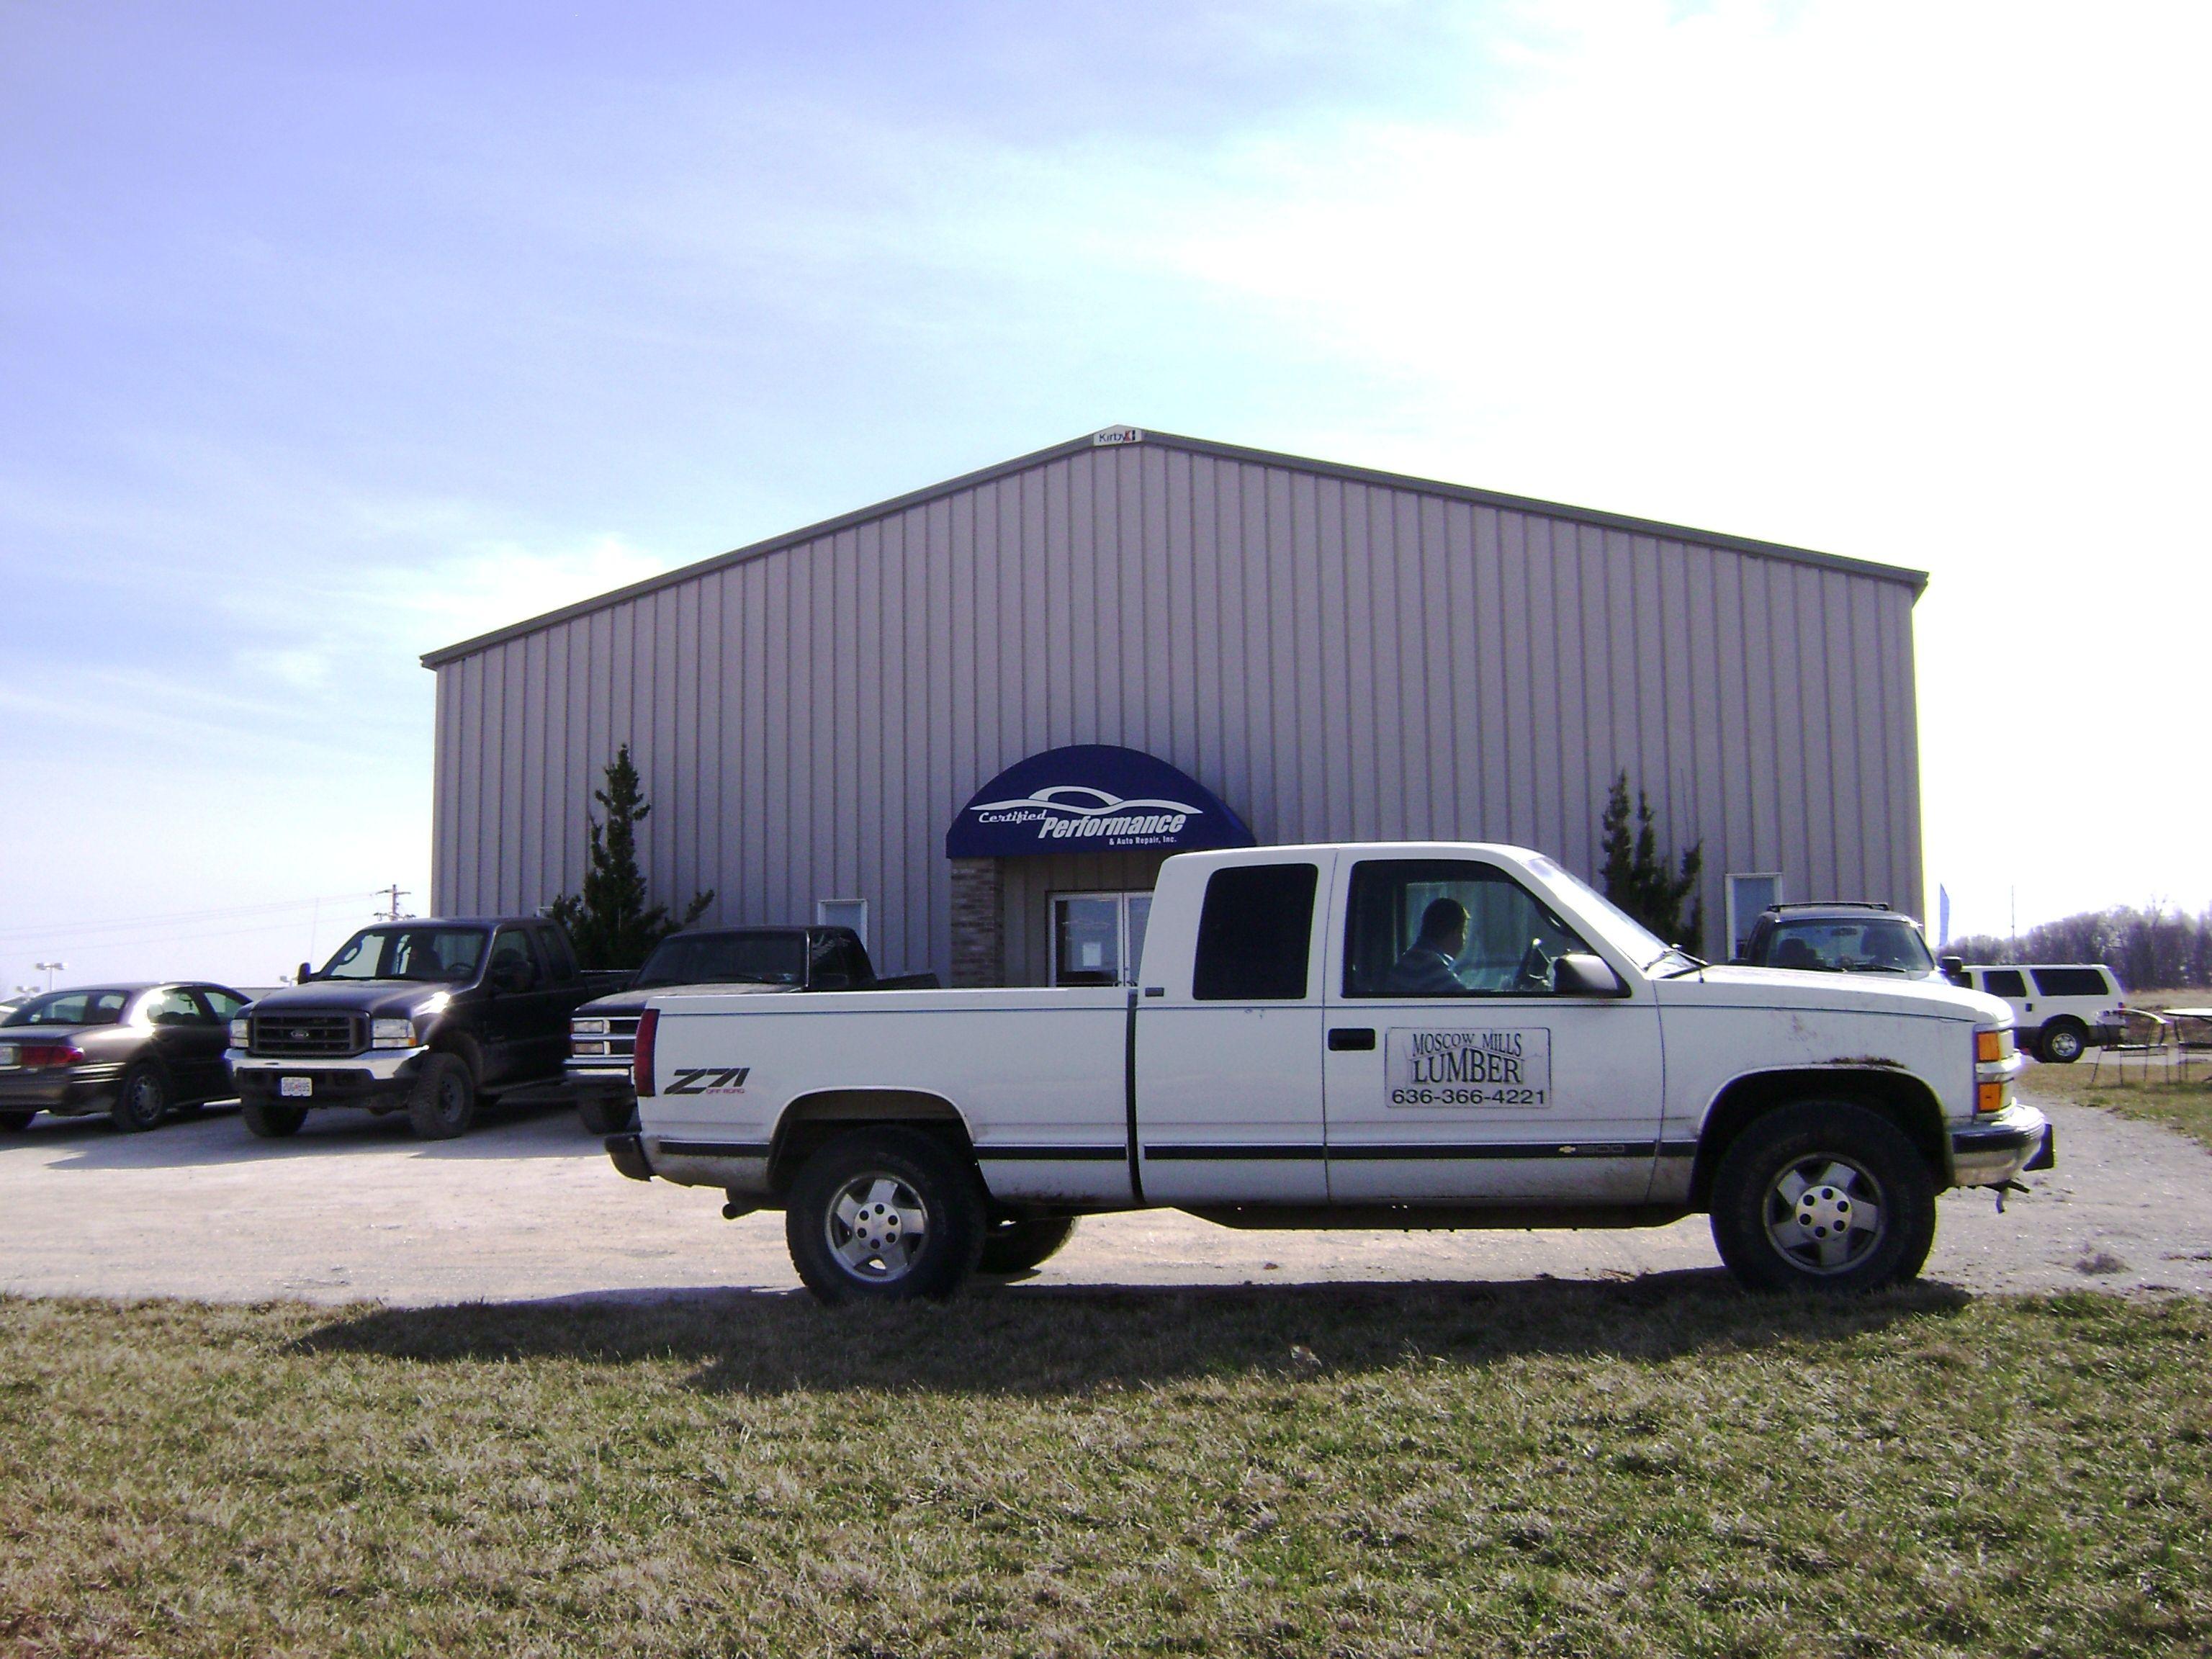 Fleet customer moscow mills lumber fleet repair auto